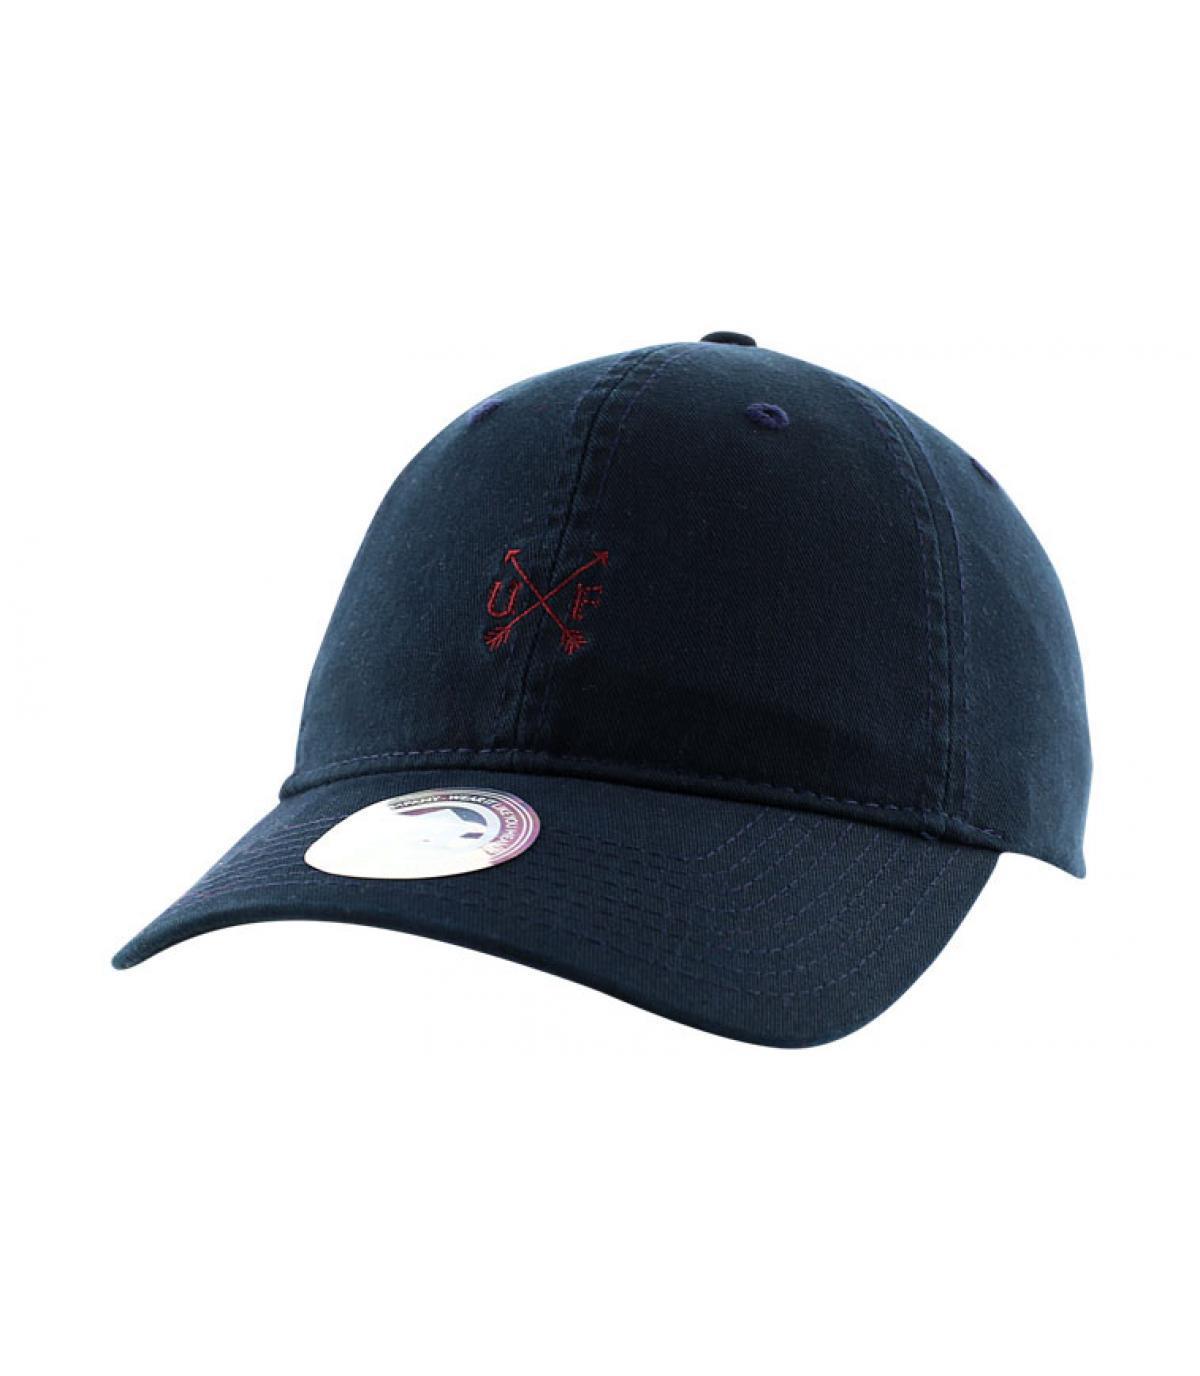 Marineblaue Trucker Cap